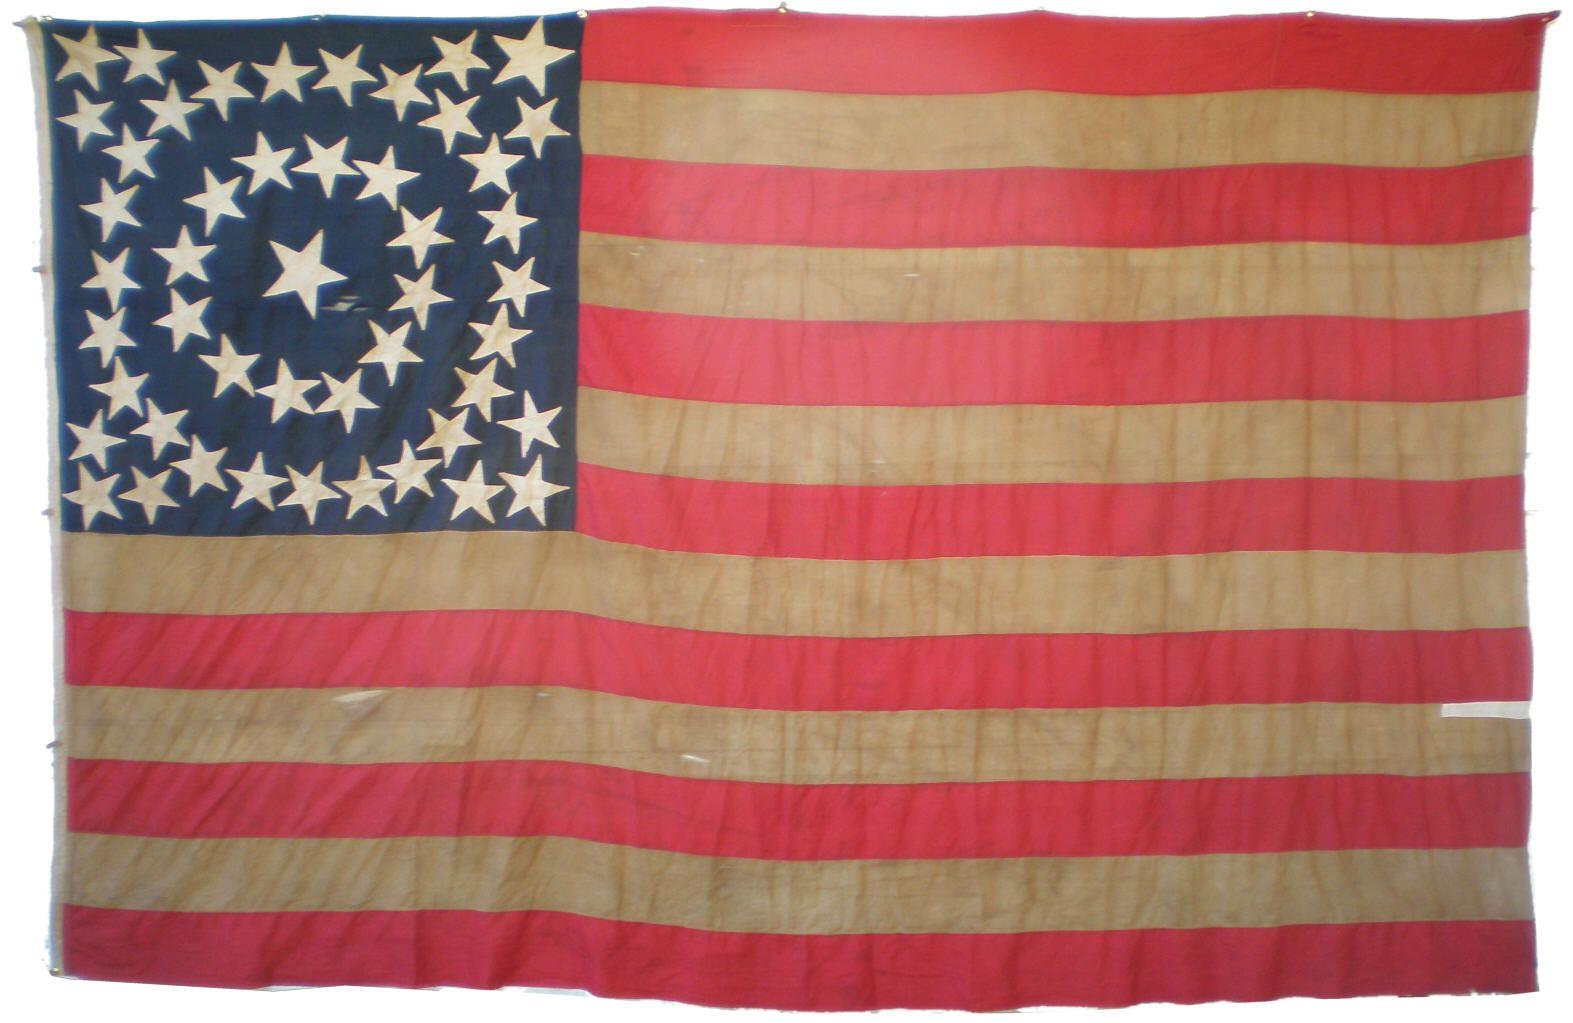 Rare Flags Antique American Flags Historic American Flags American Flag Vintage American Flag Vintage Flag